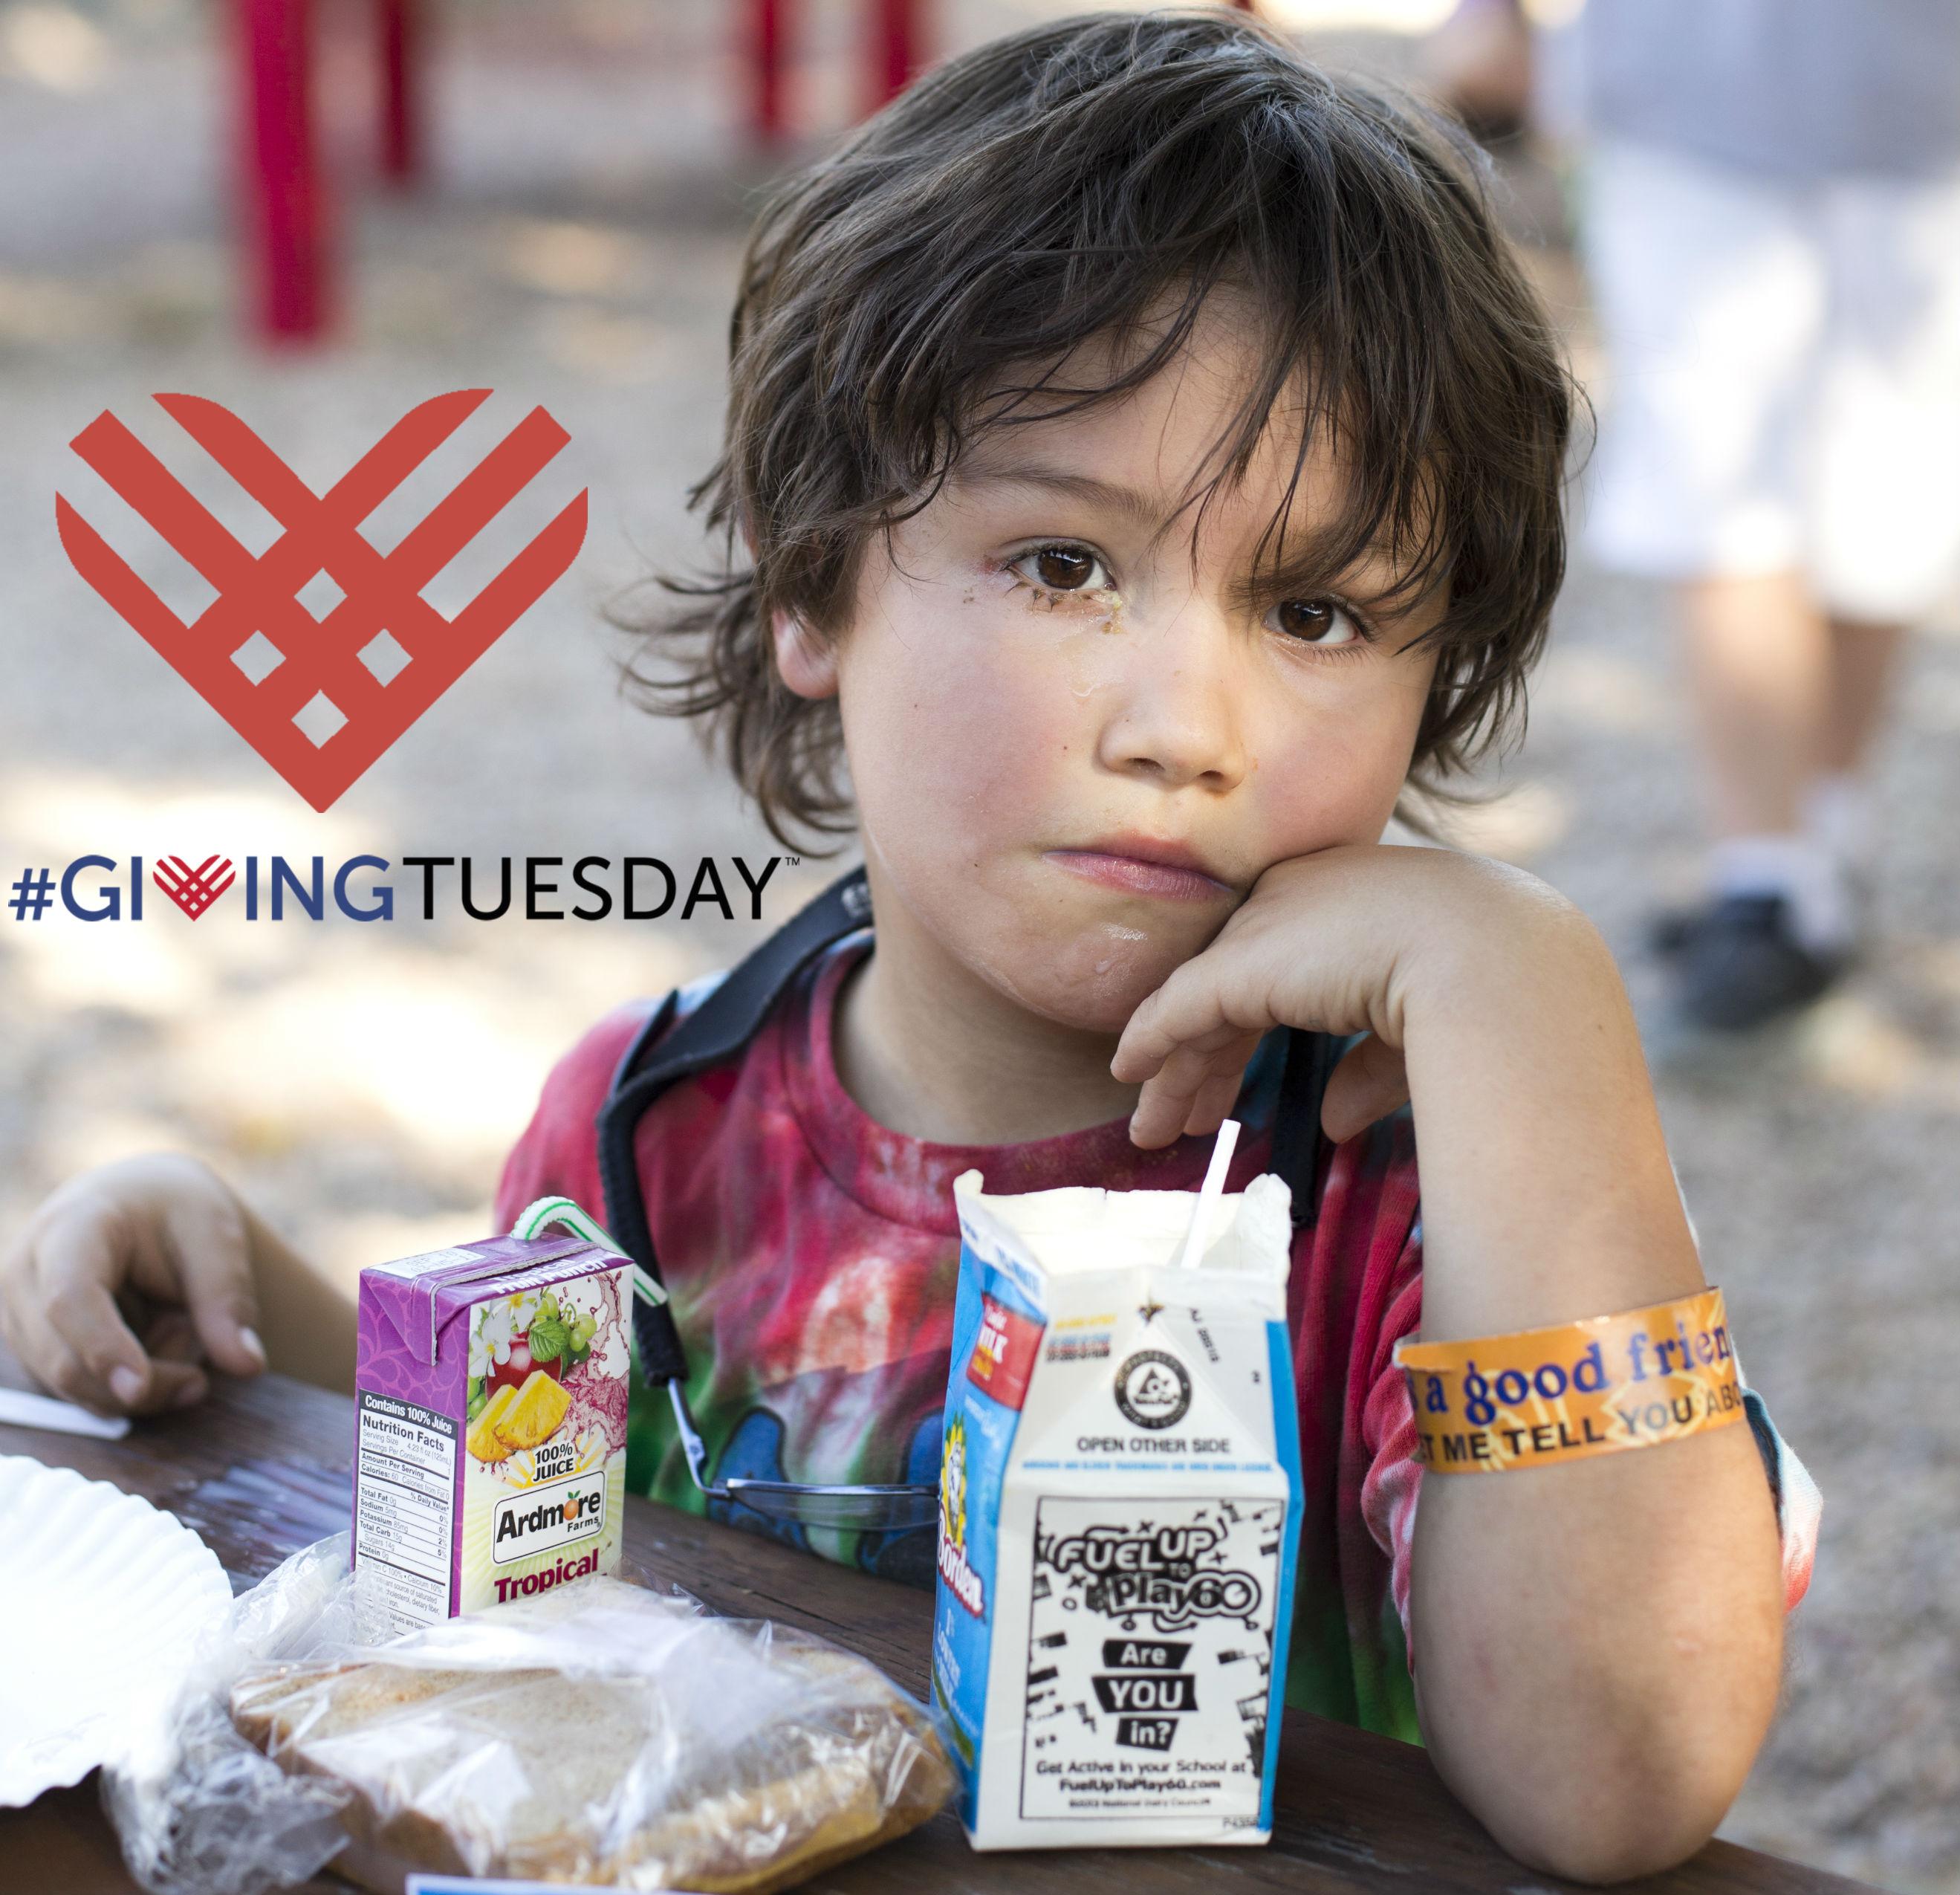 #GivingTuesday Child